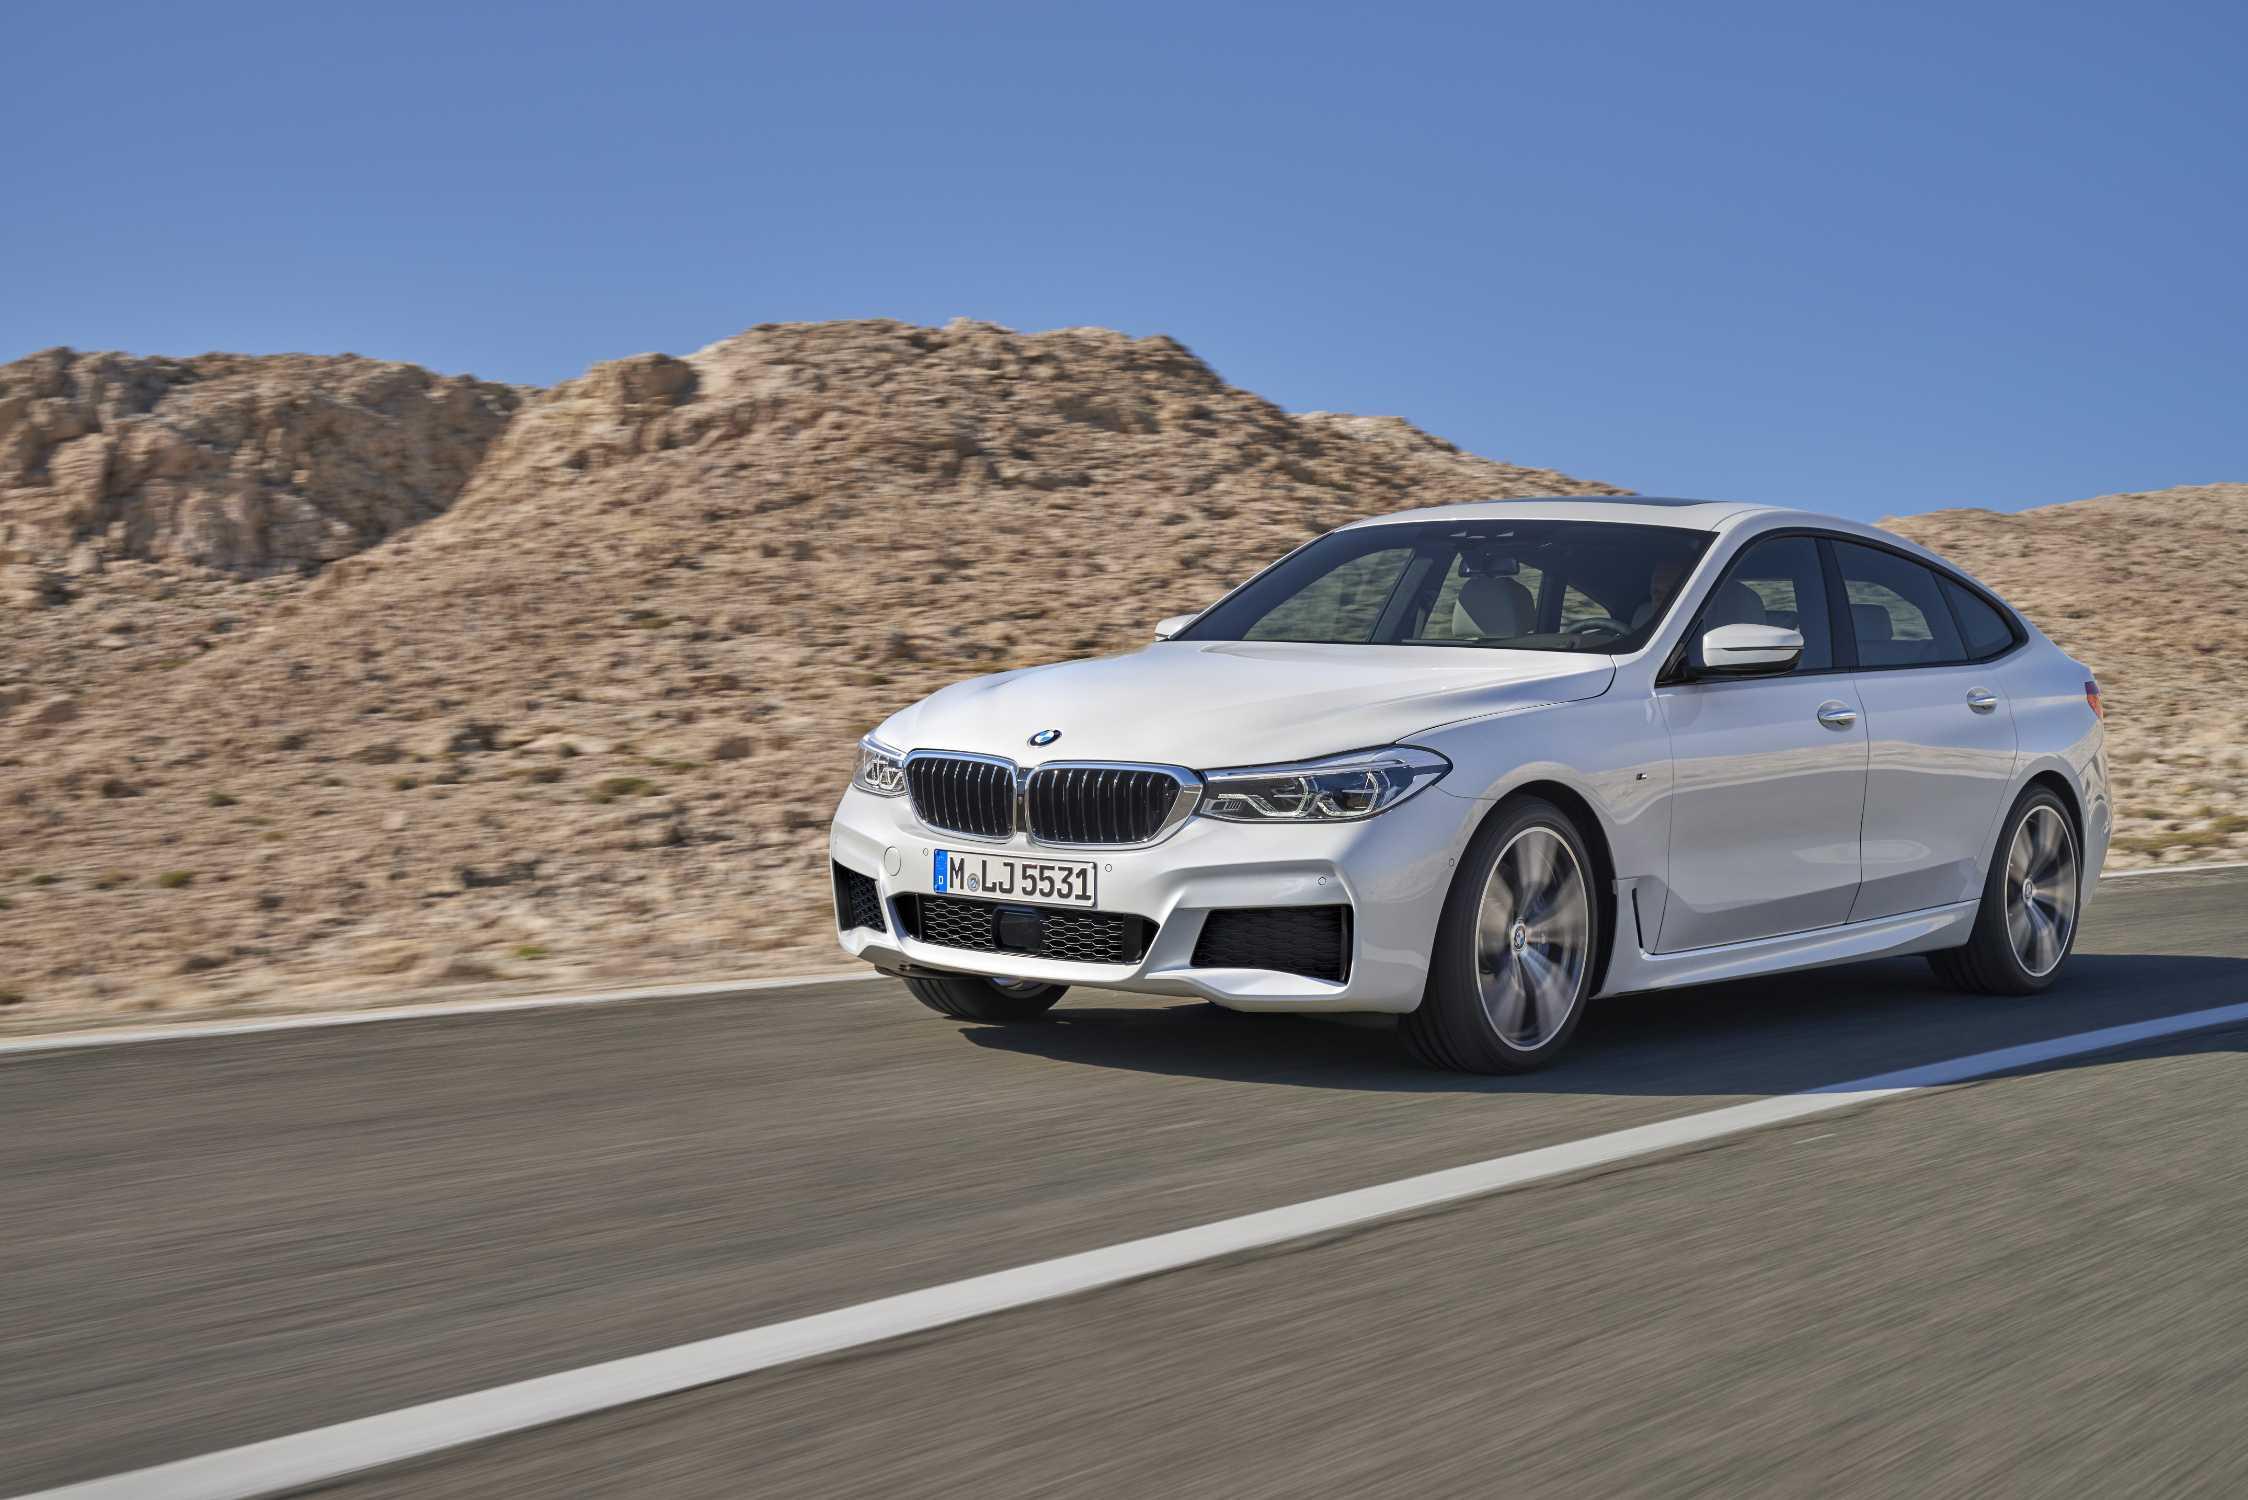 BMW 6 Series Gran Turismo, 640i xDrive, Mineral white, M ...